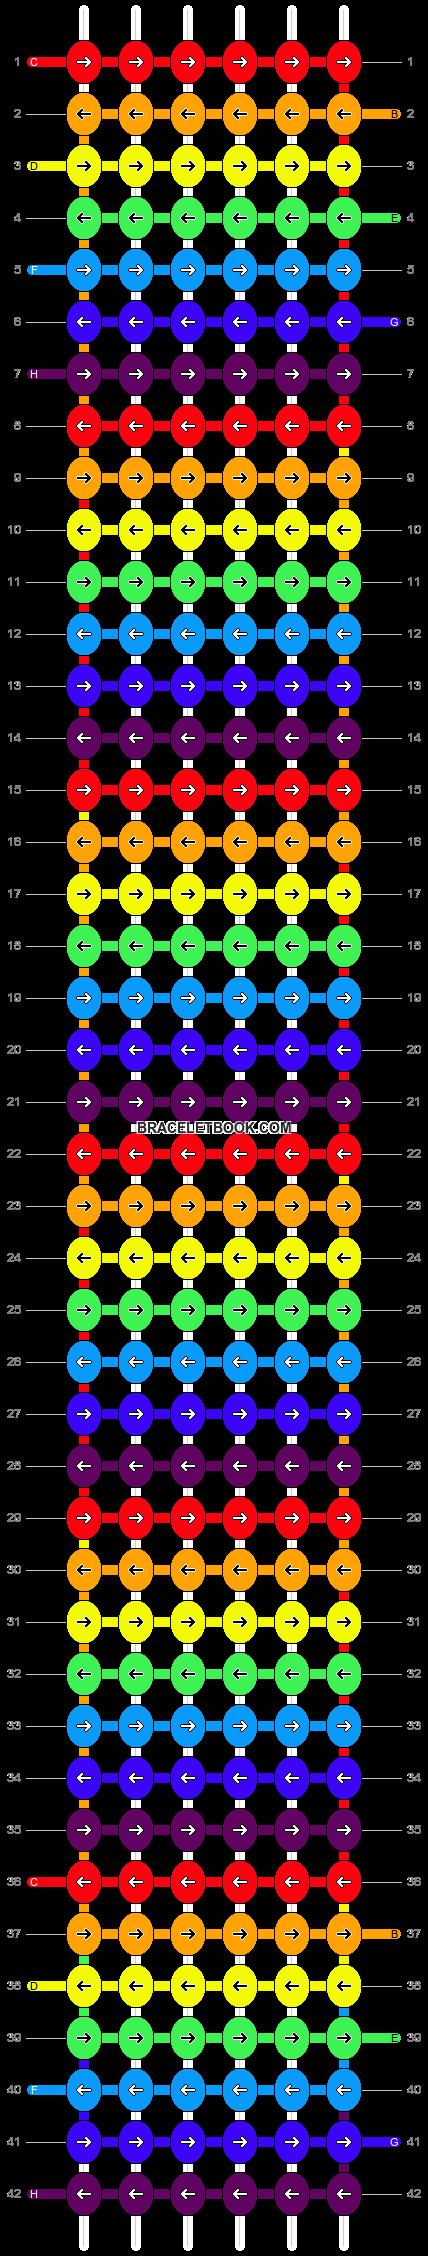 Alpha Pattern #12398 added by ChrisChua